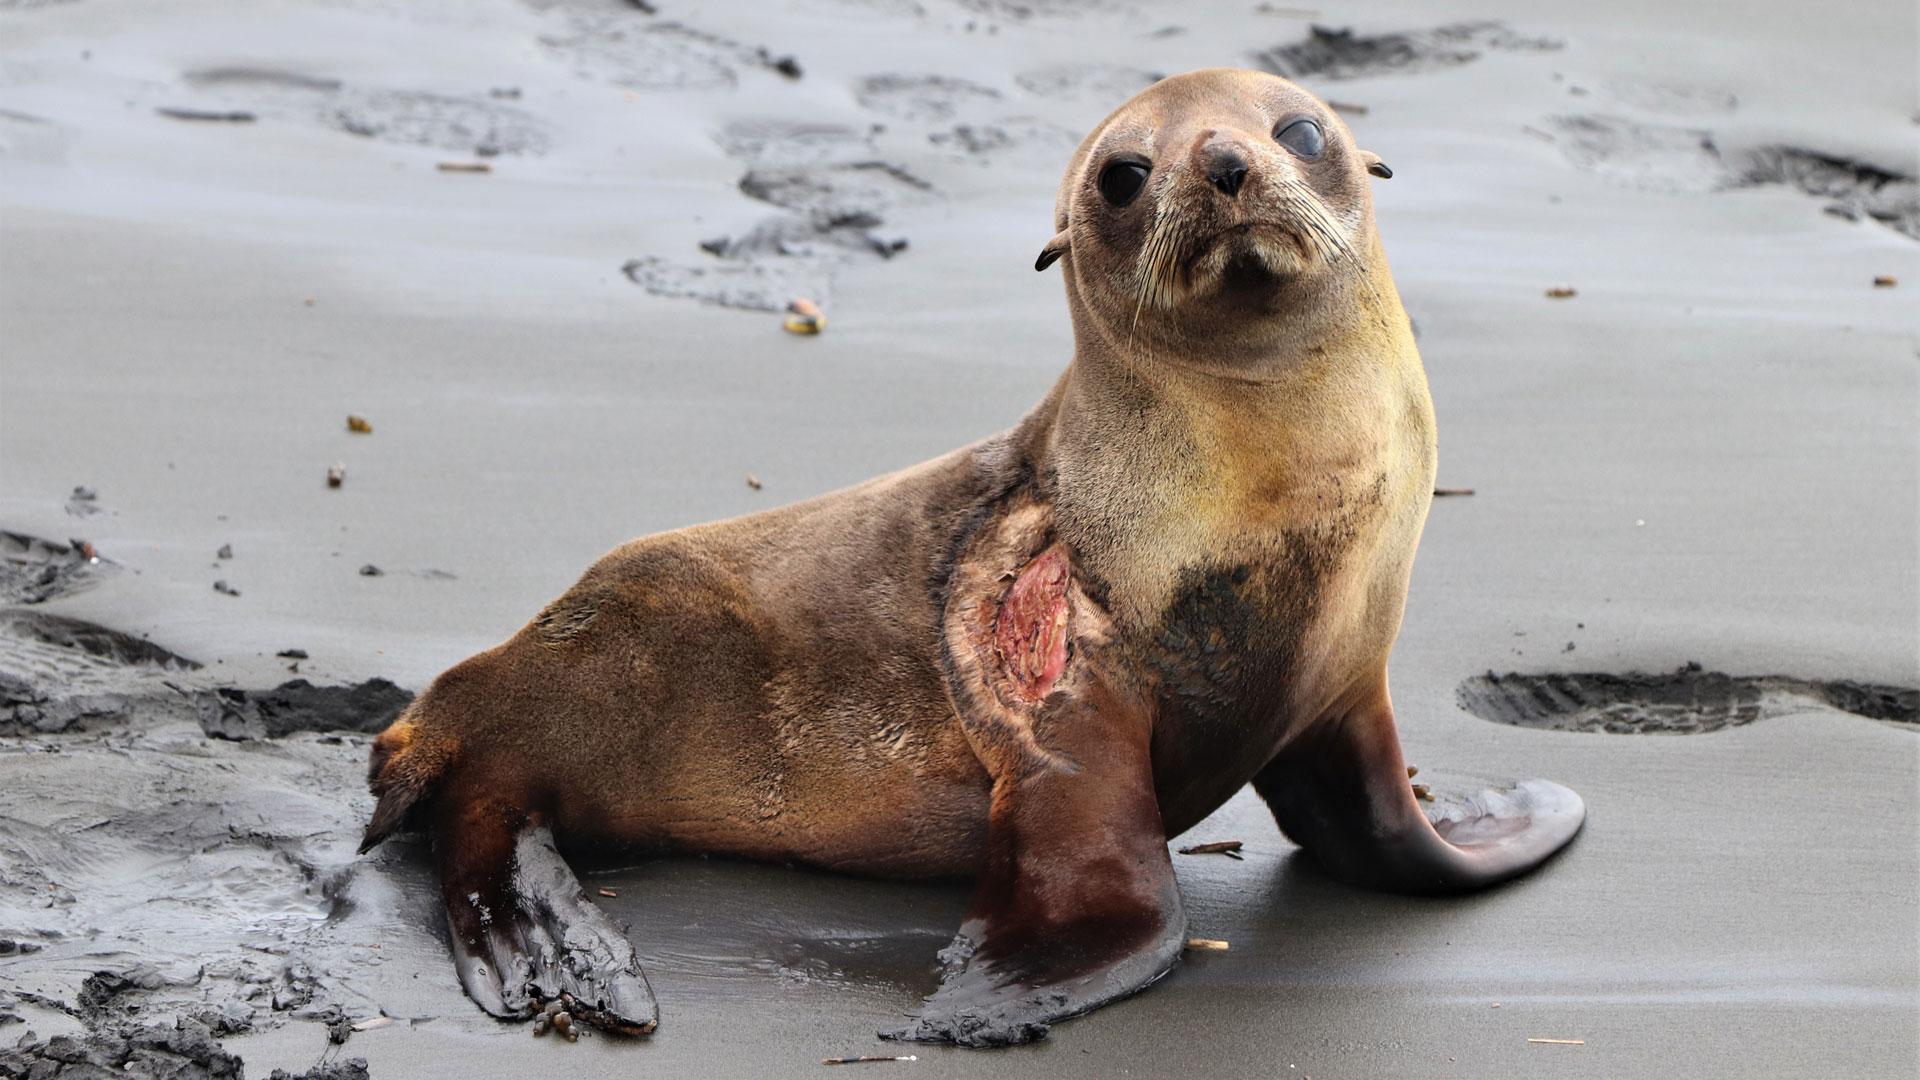 https://rfacdn.nz/zoo/assets/media/nz-fur-seal-gallery-2.jpg